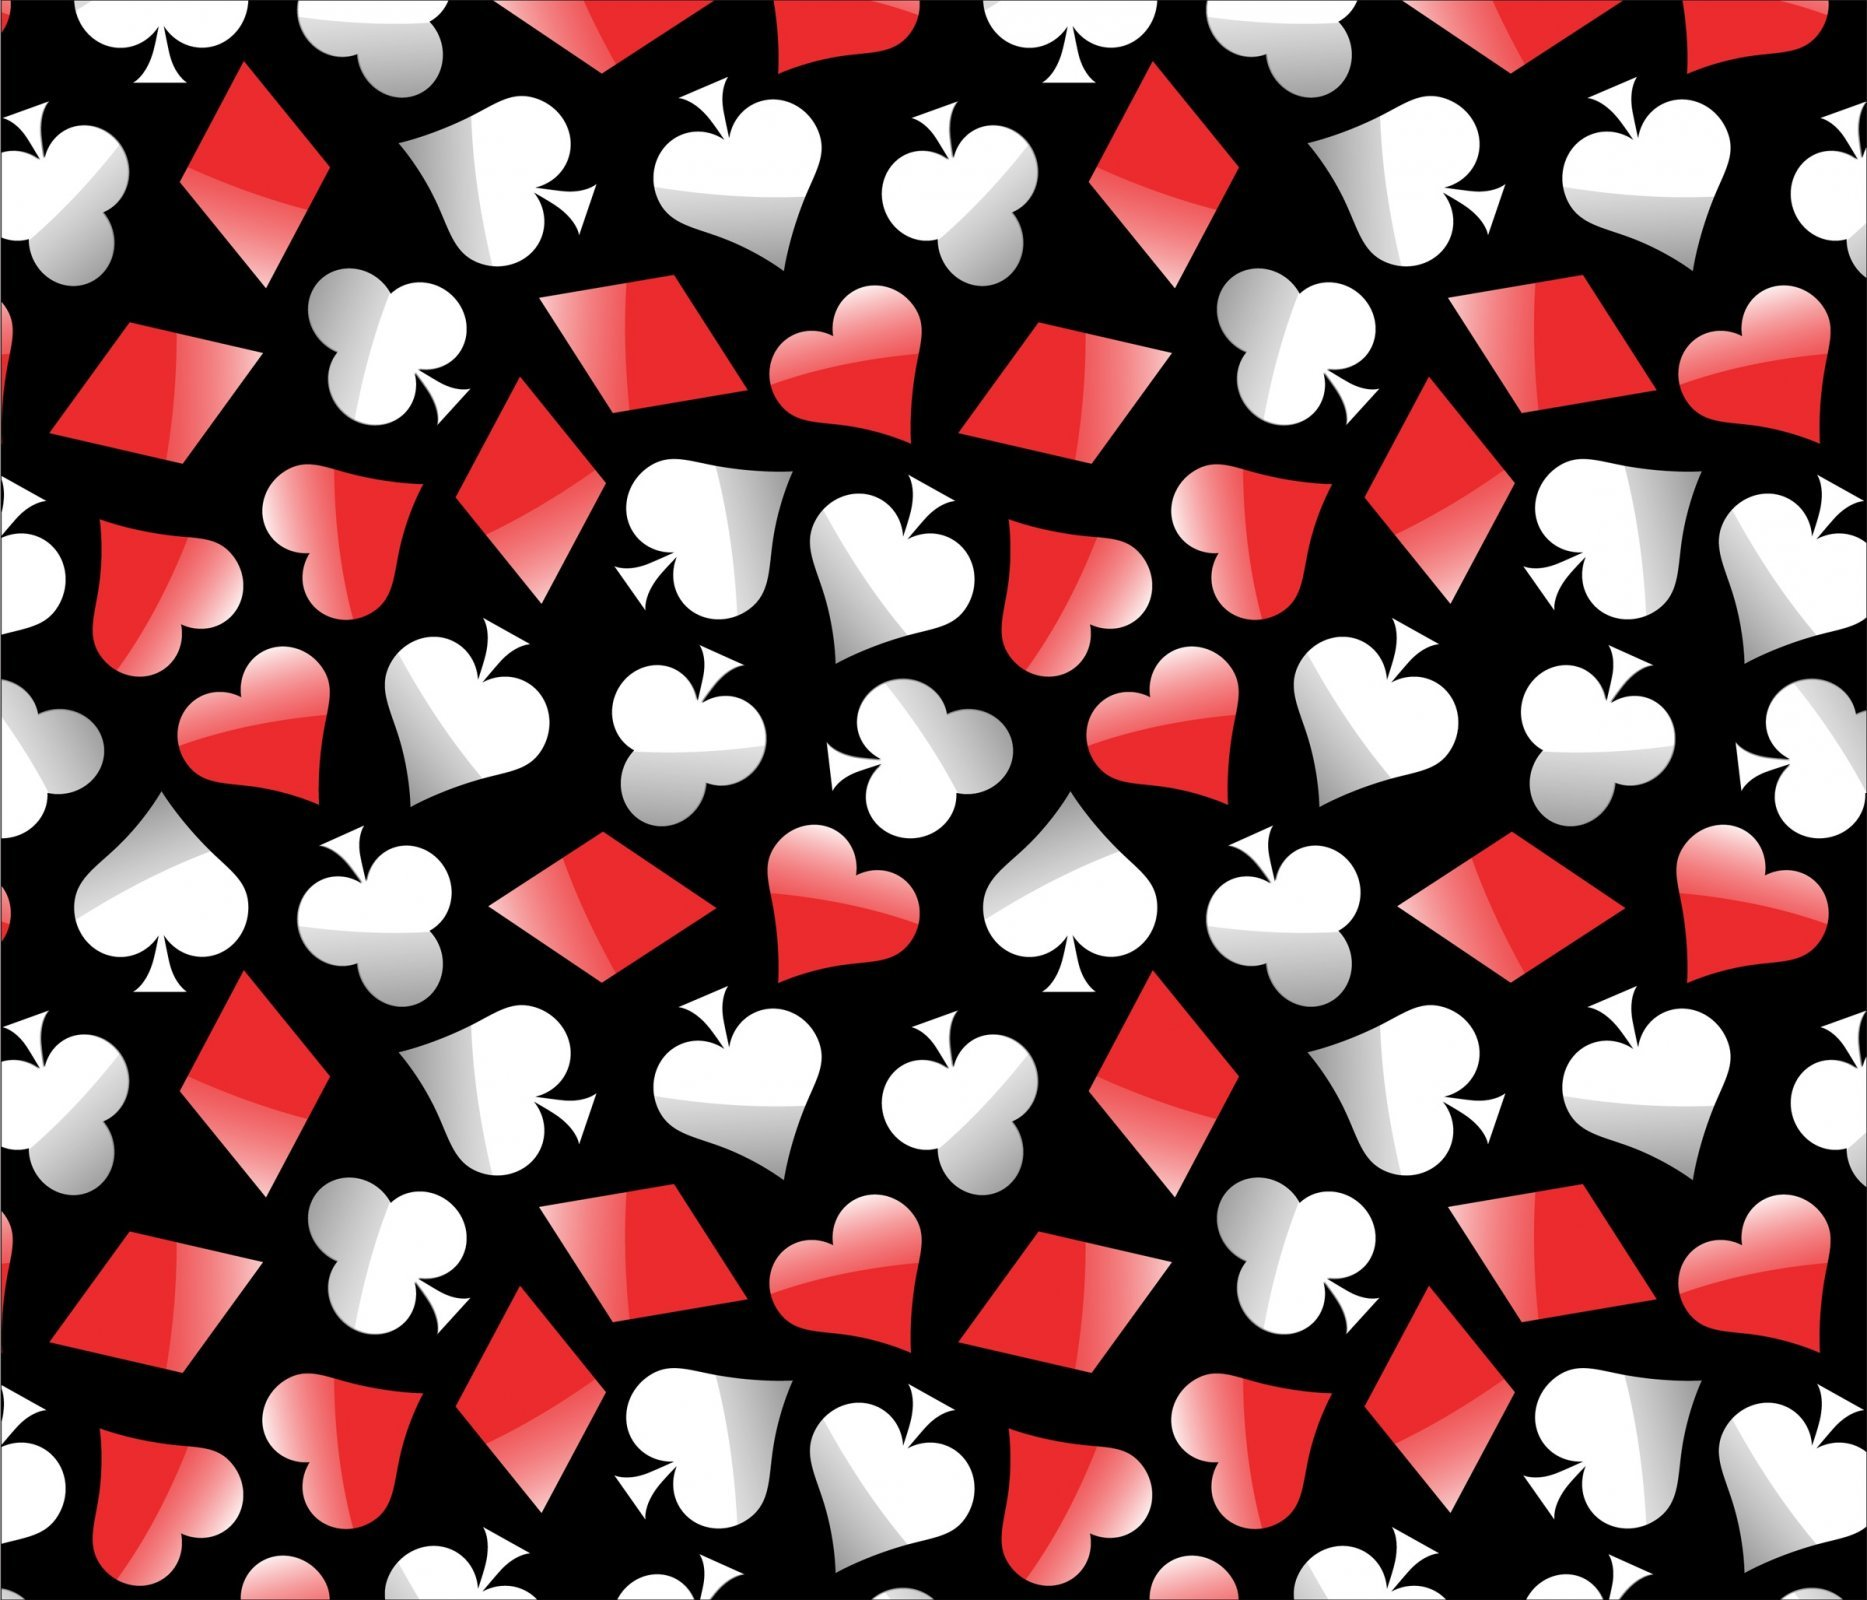 Poker Symbols on Black David Textiles Exclusive Digital Prints Fabric by the Yard